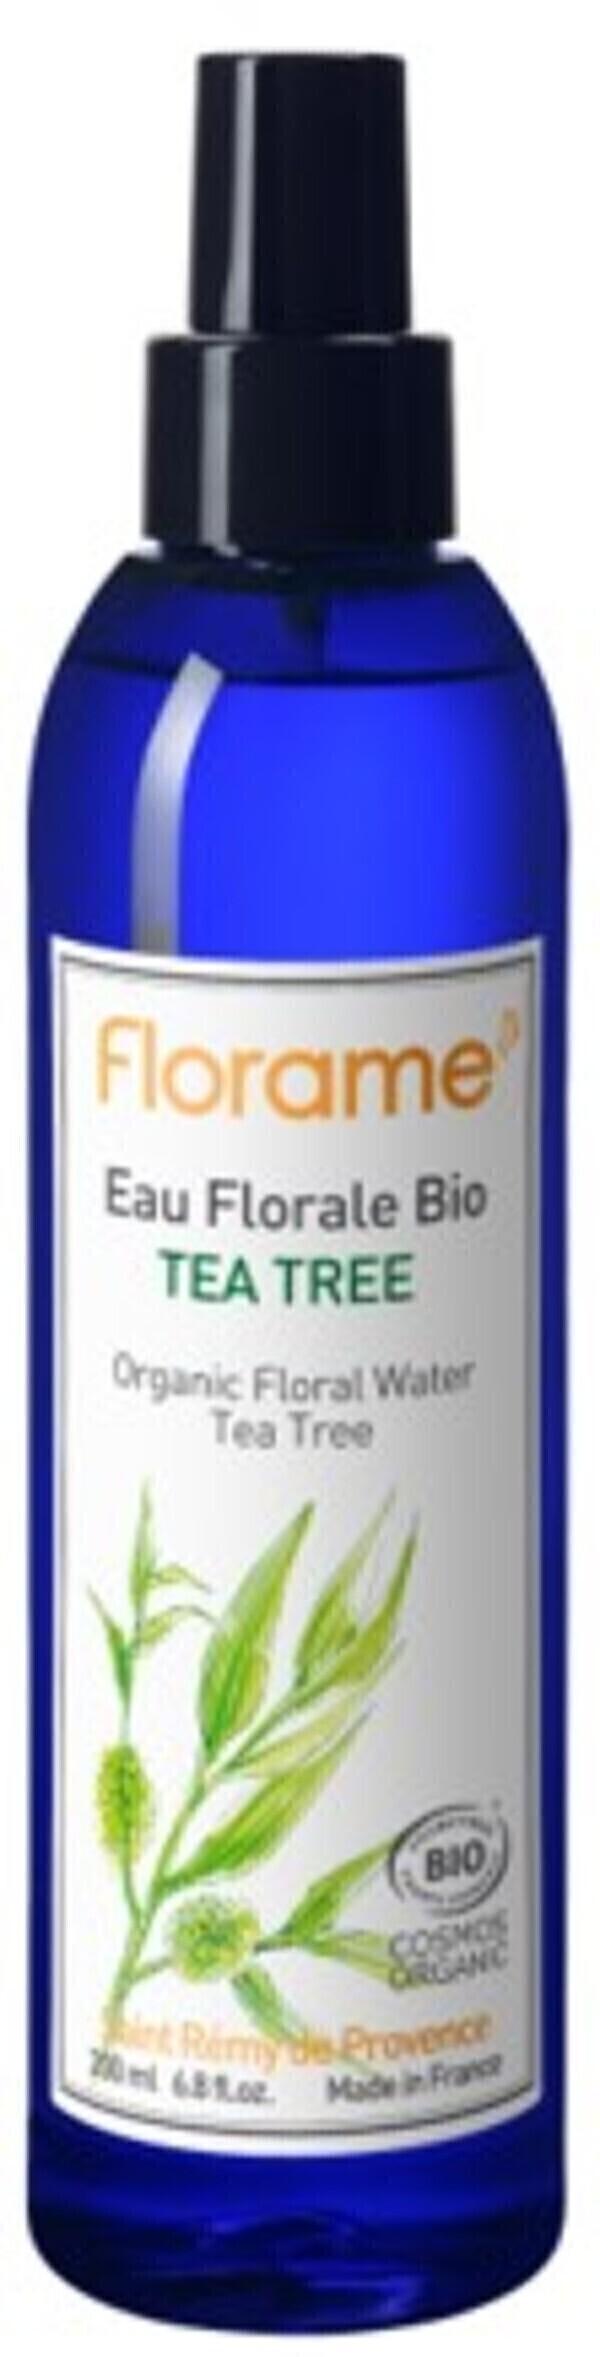 Florame - Eau florale de Tea Tree 200ml